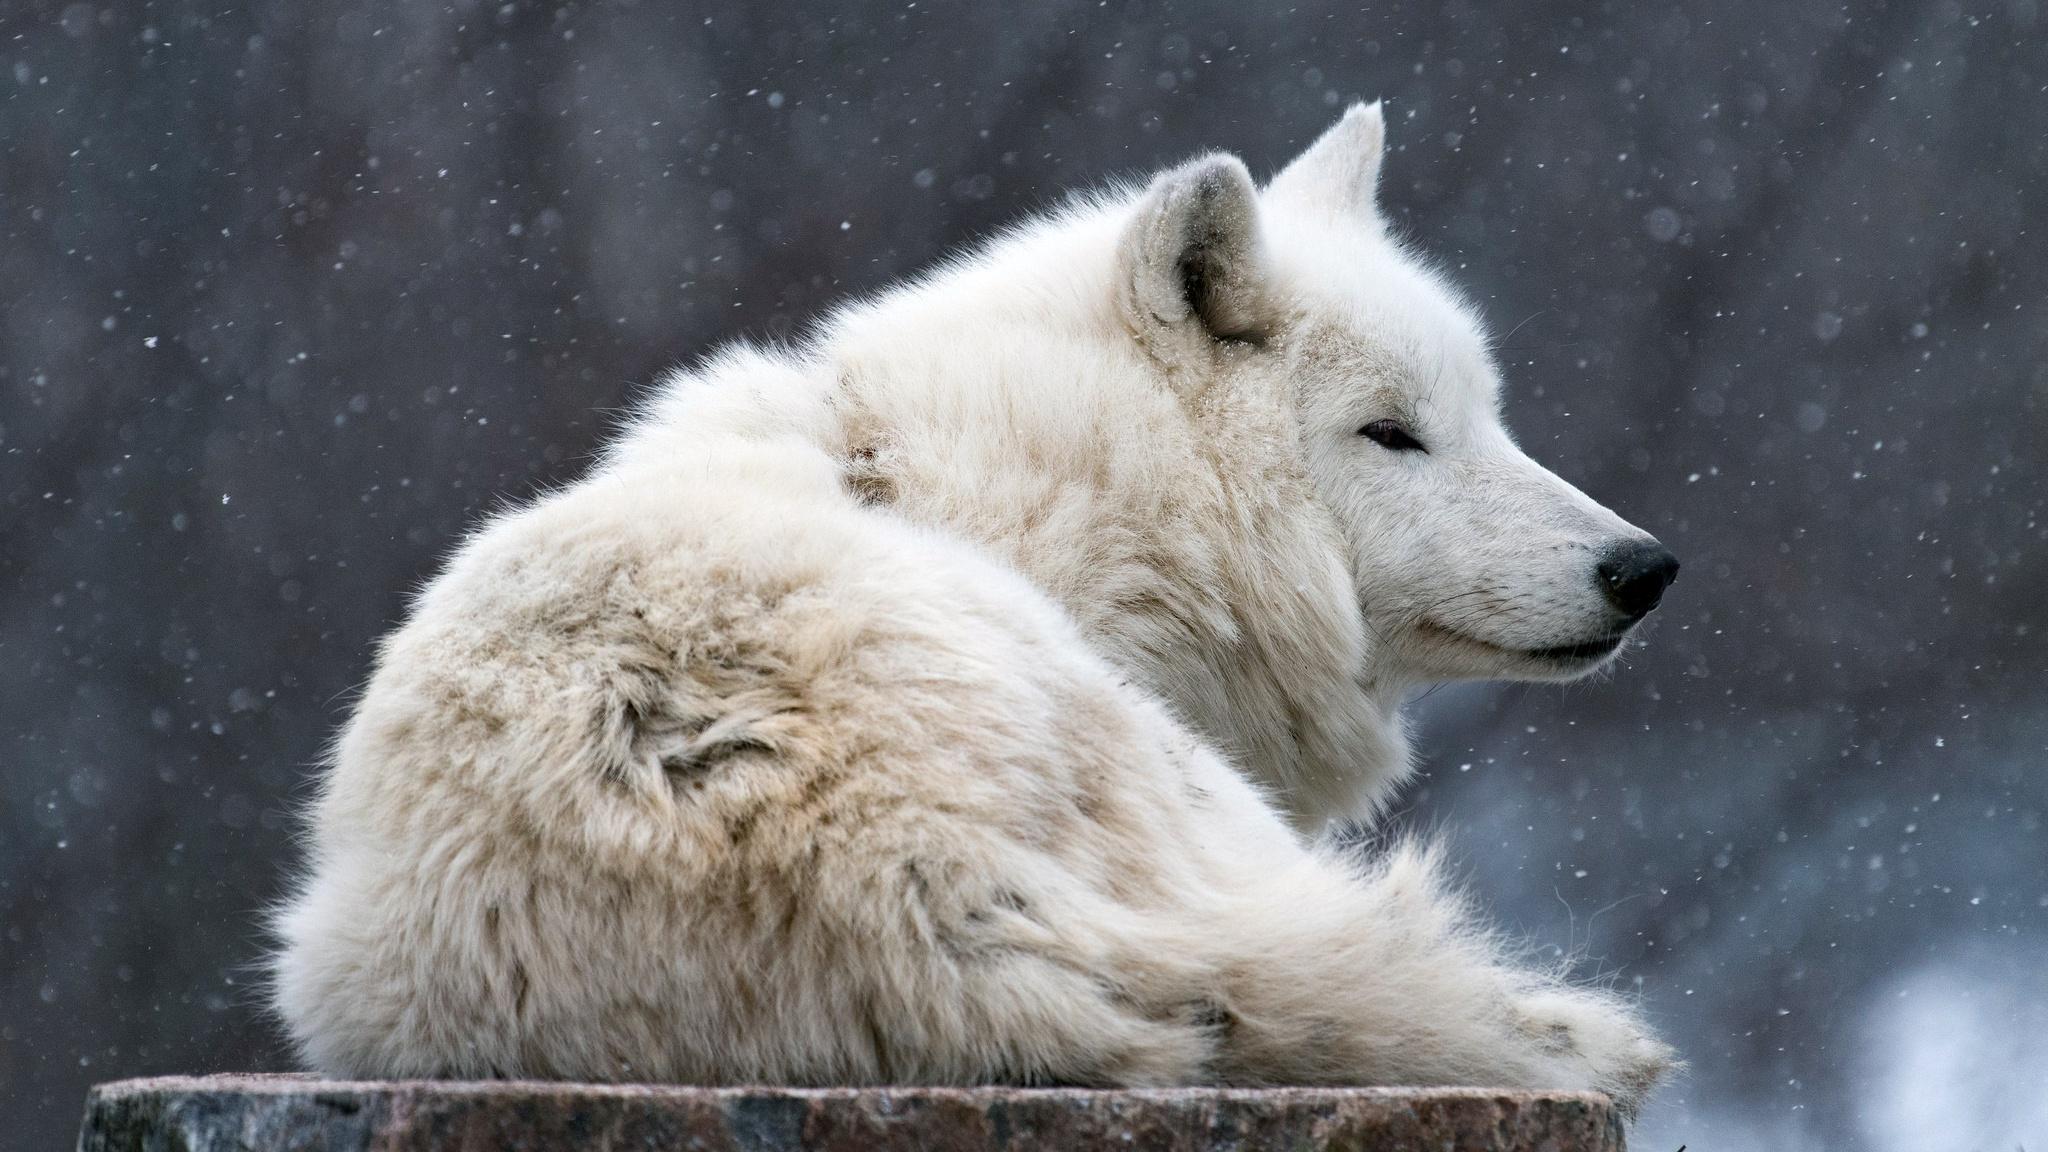 https://img4.goodfon.ru/original/2048x1152/7/a3/arkticheskii-poliarnyi-vetki-goluboi-fon-morda-arkticheski-1.jpg